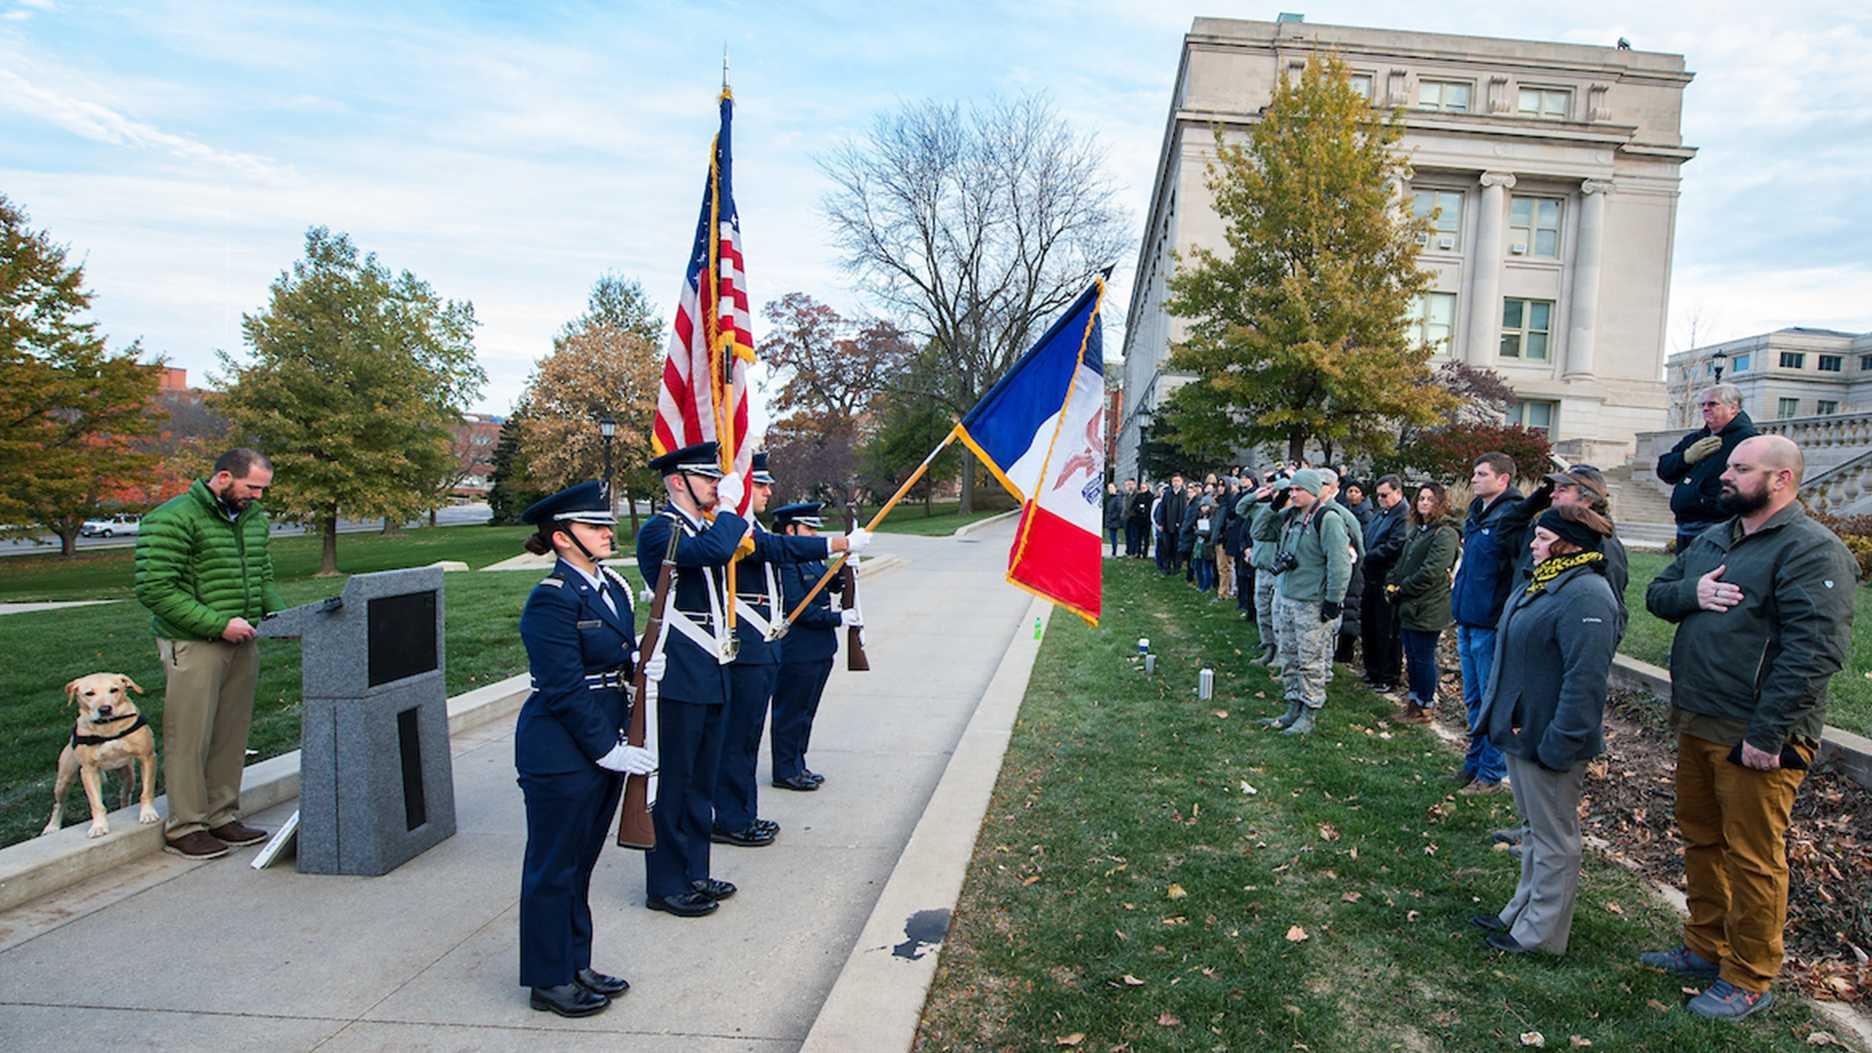 Veterans Day Reveille and Opening Ceremony on the Pentacrest, Friday Nov.10, 2017. (Justin Torner, University of Iowa)